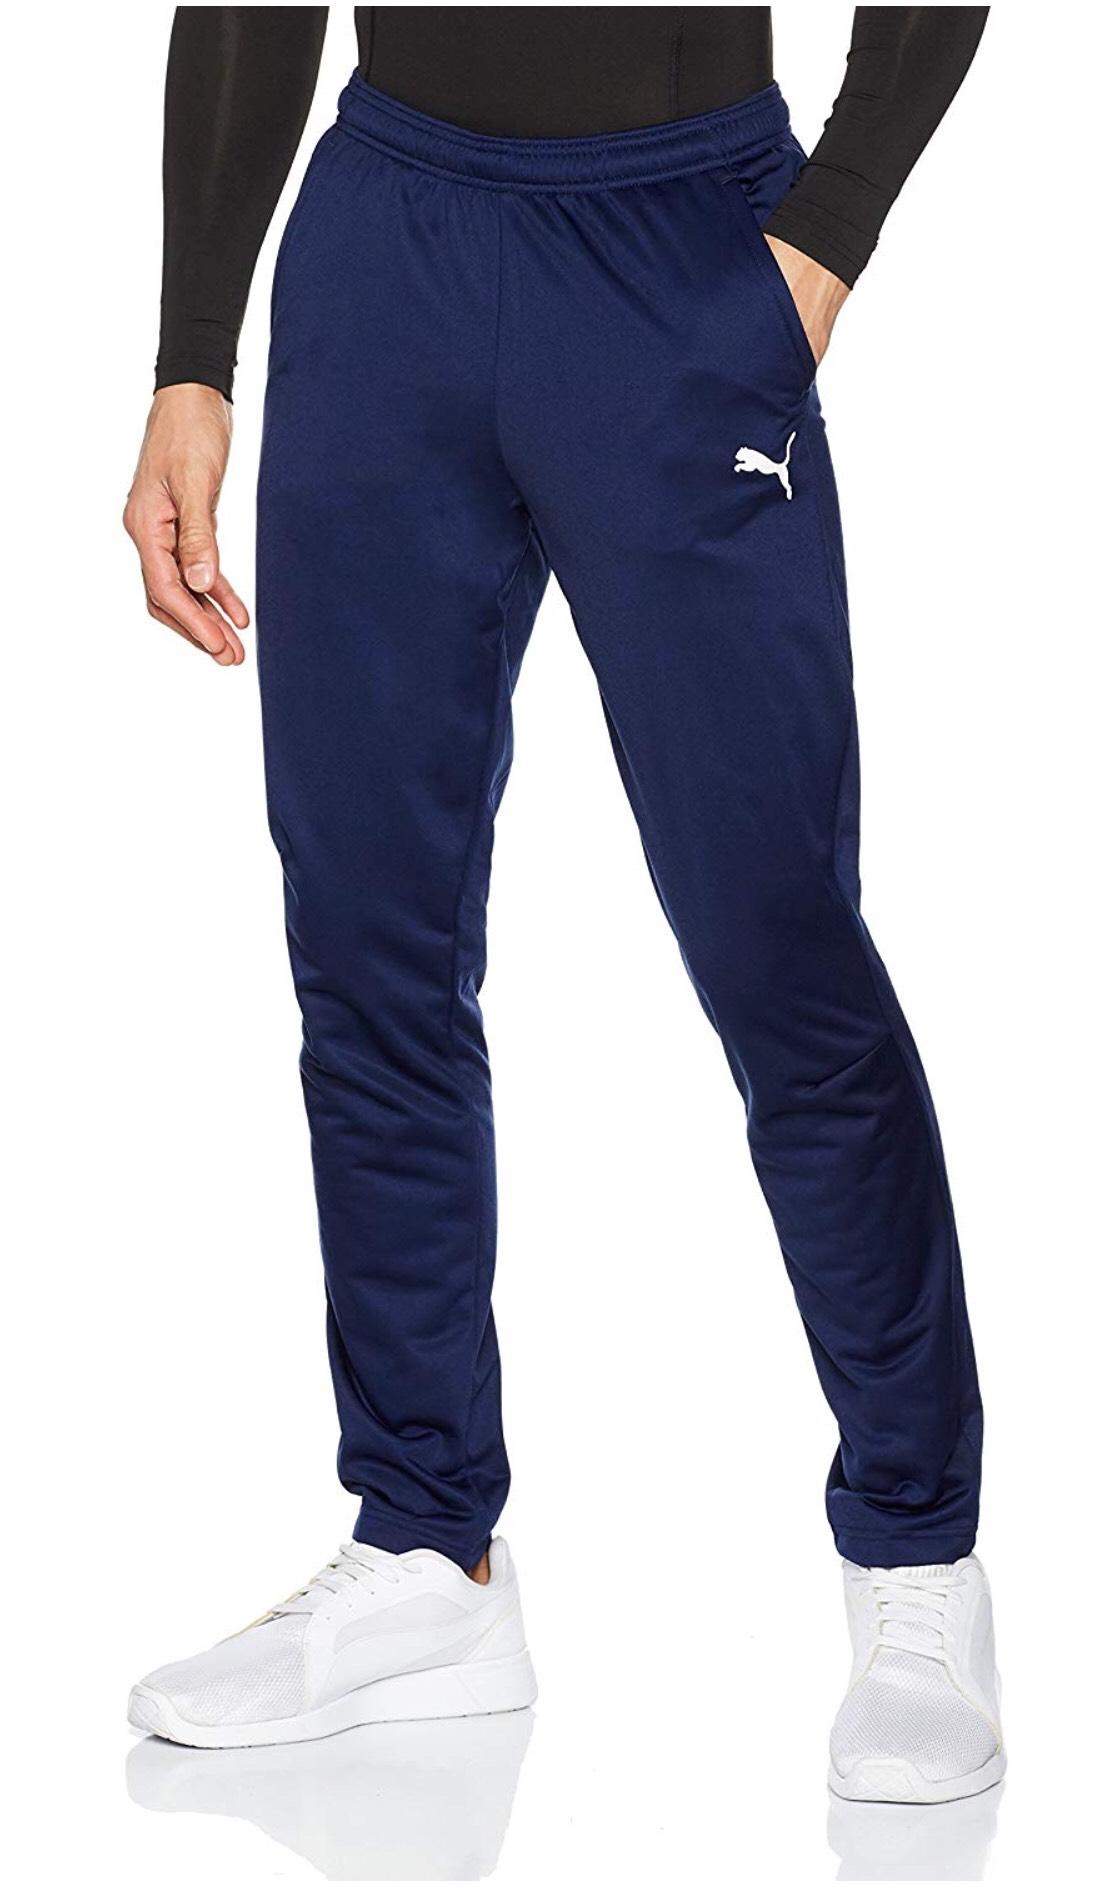 Puma Liga Training Core Pants - Peacoat White, X-Large £6.50 @ Amazon. (Free Prime Delivery or £4.99 non-Prime)